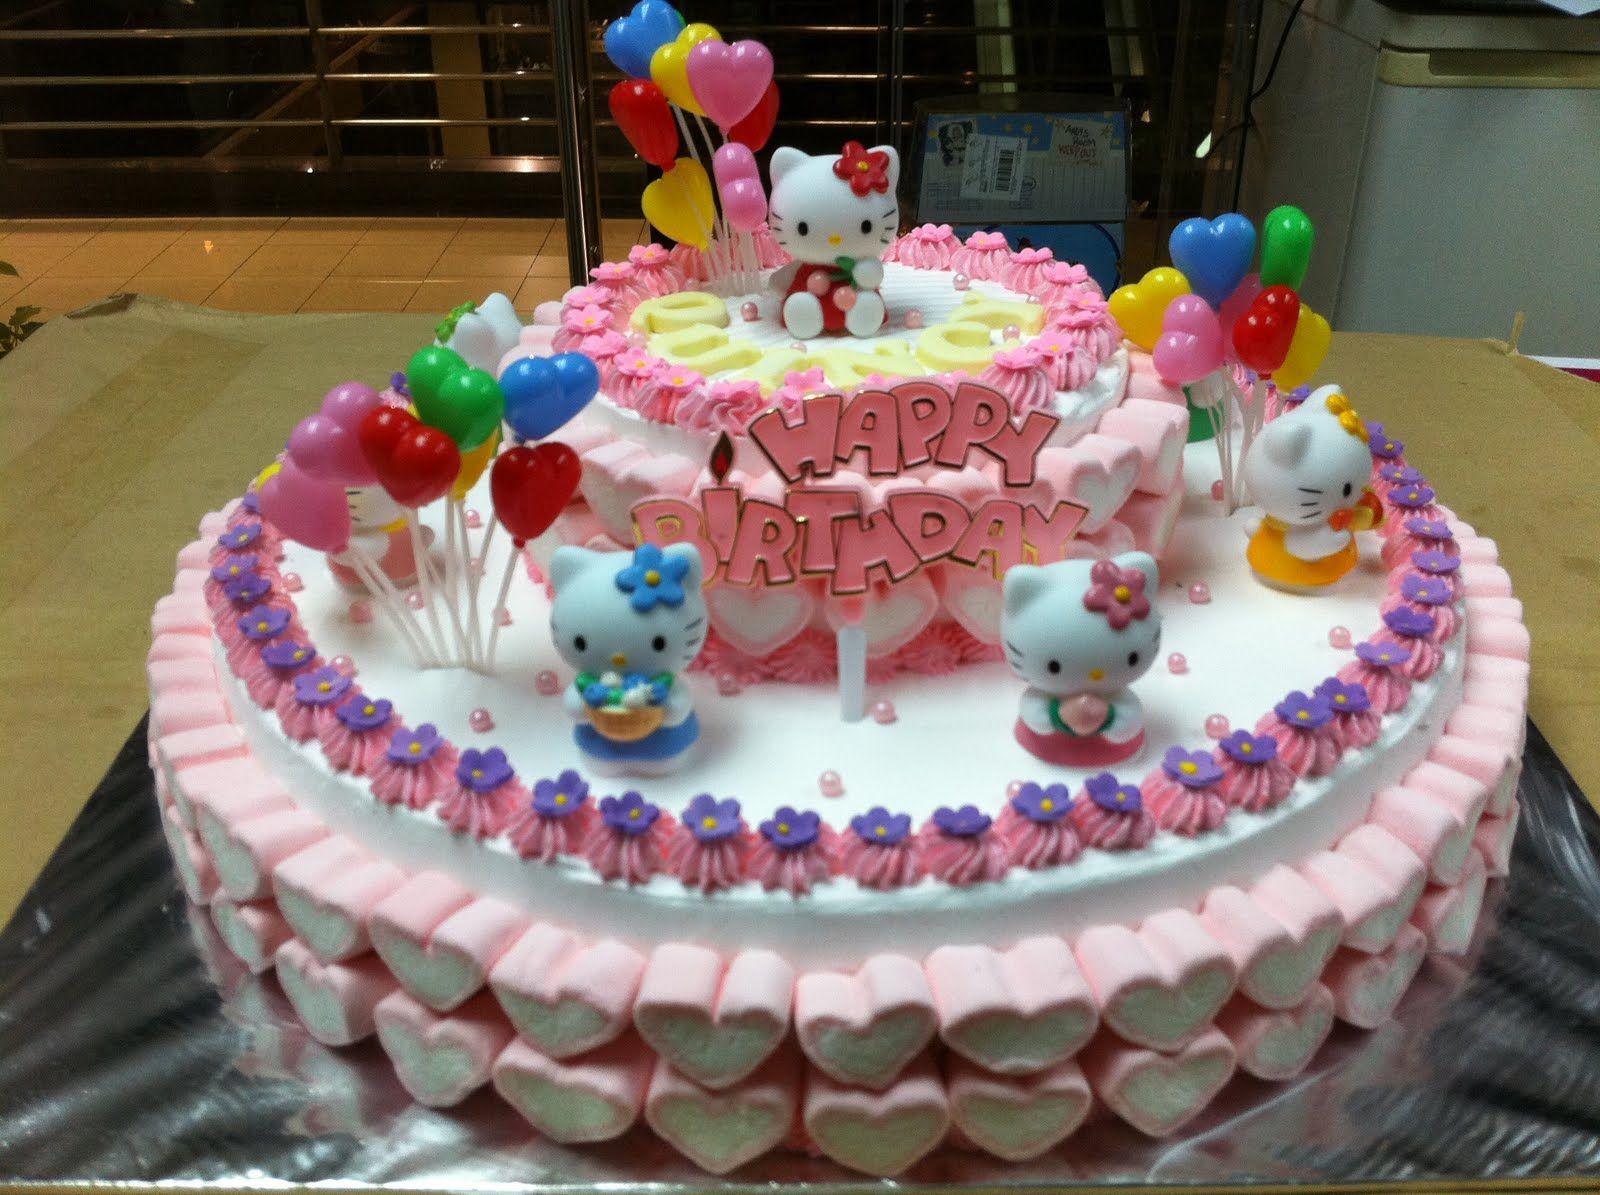 Stupendous 27 Excellent Image Of Order Birthday Cakes Online Birthday Cake Funny Birthday Cards Online Hetedamsfinfo